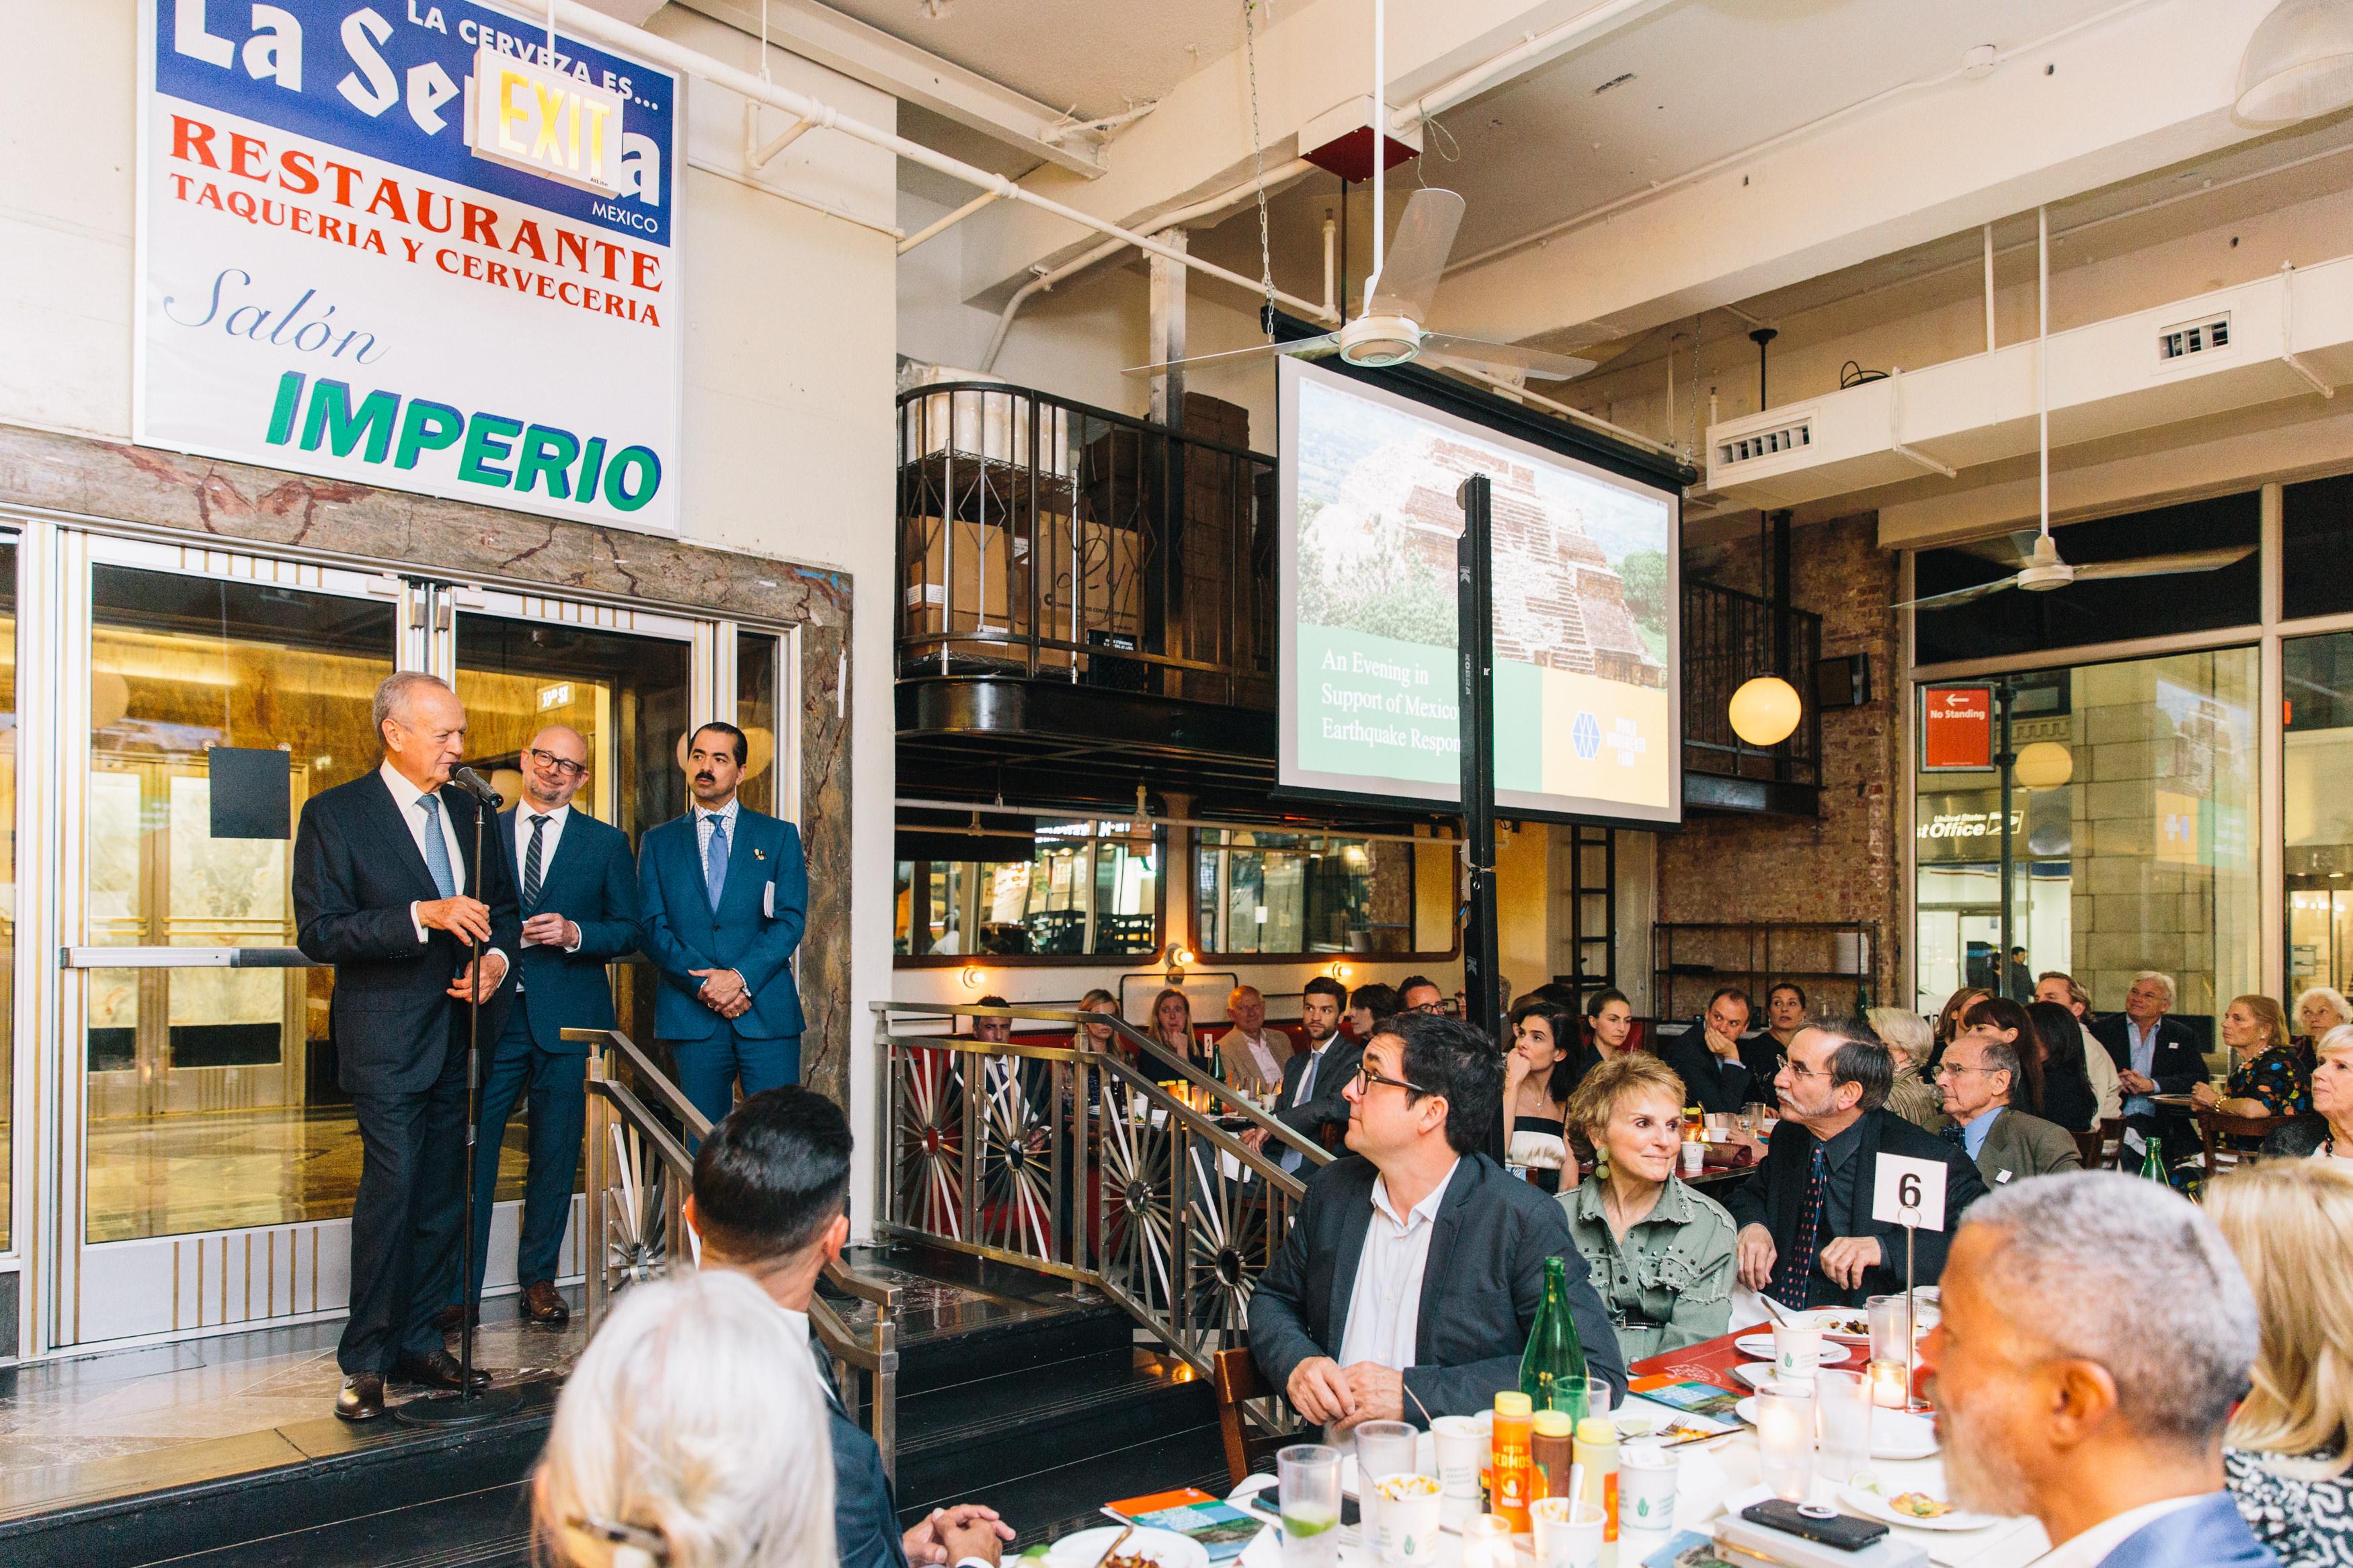 Roberto Hernández Ramírez gives remarks on the importance of restoring Monte Albán.